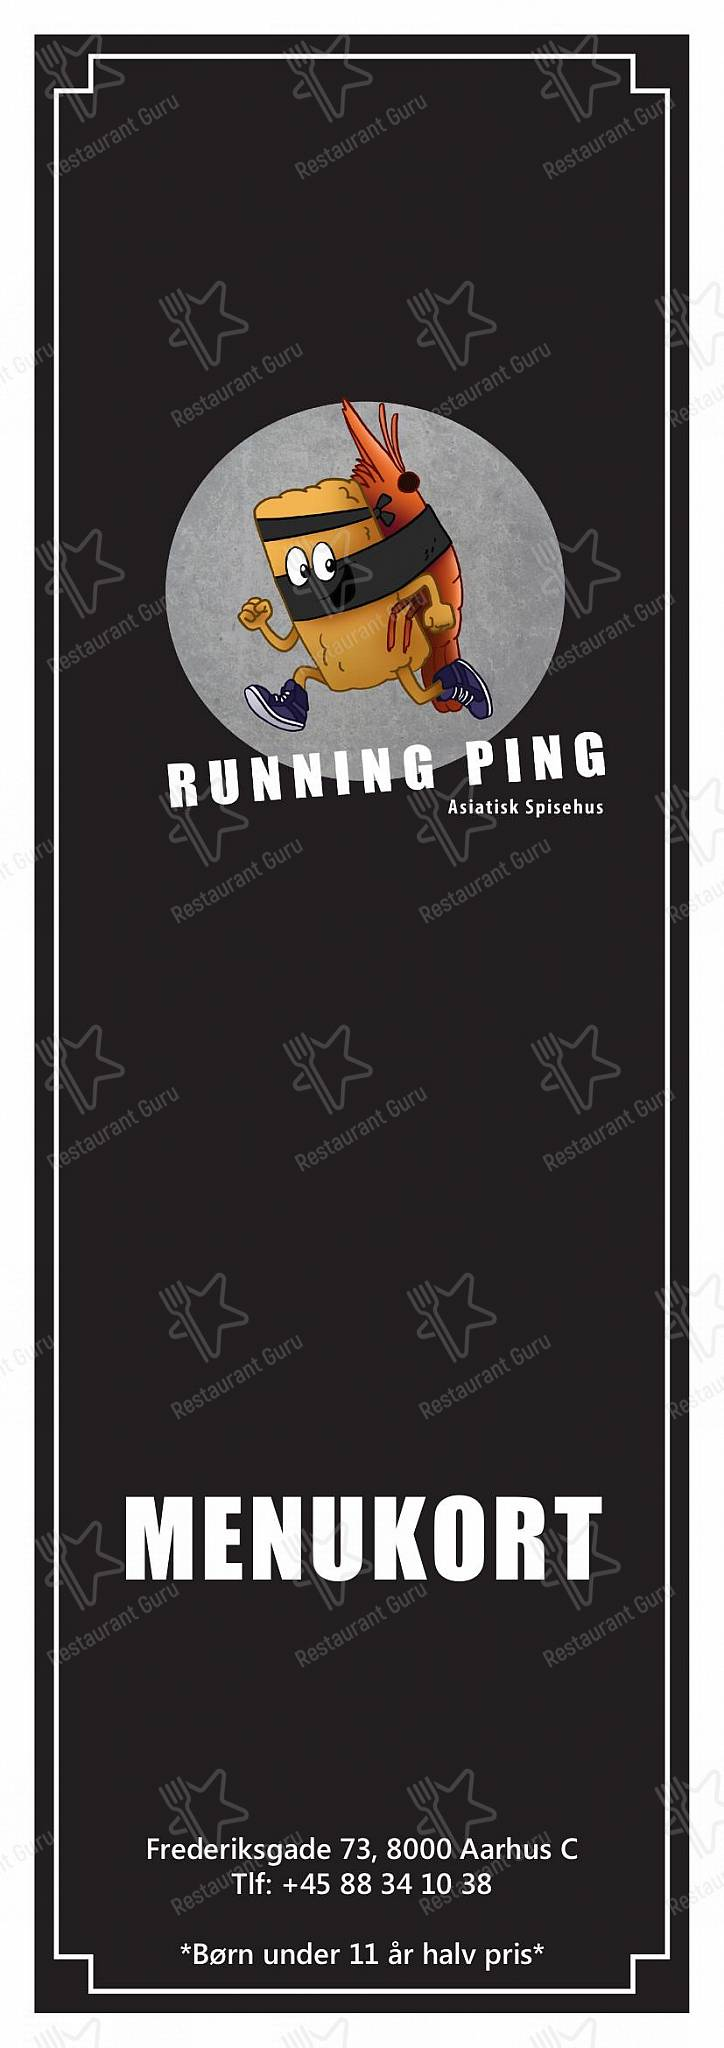 Menu for the Running Ping restaurant